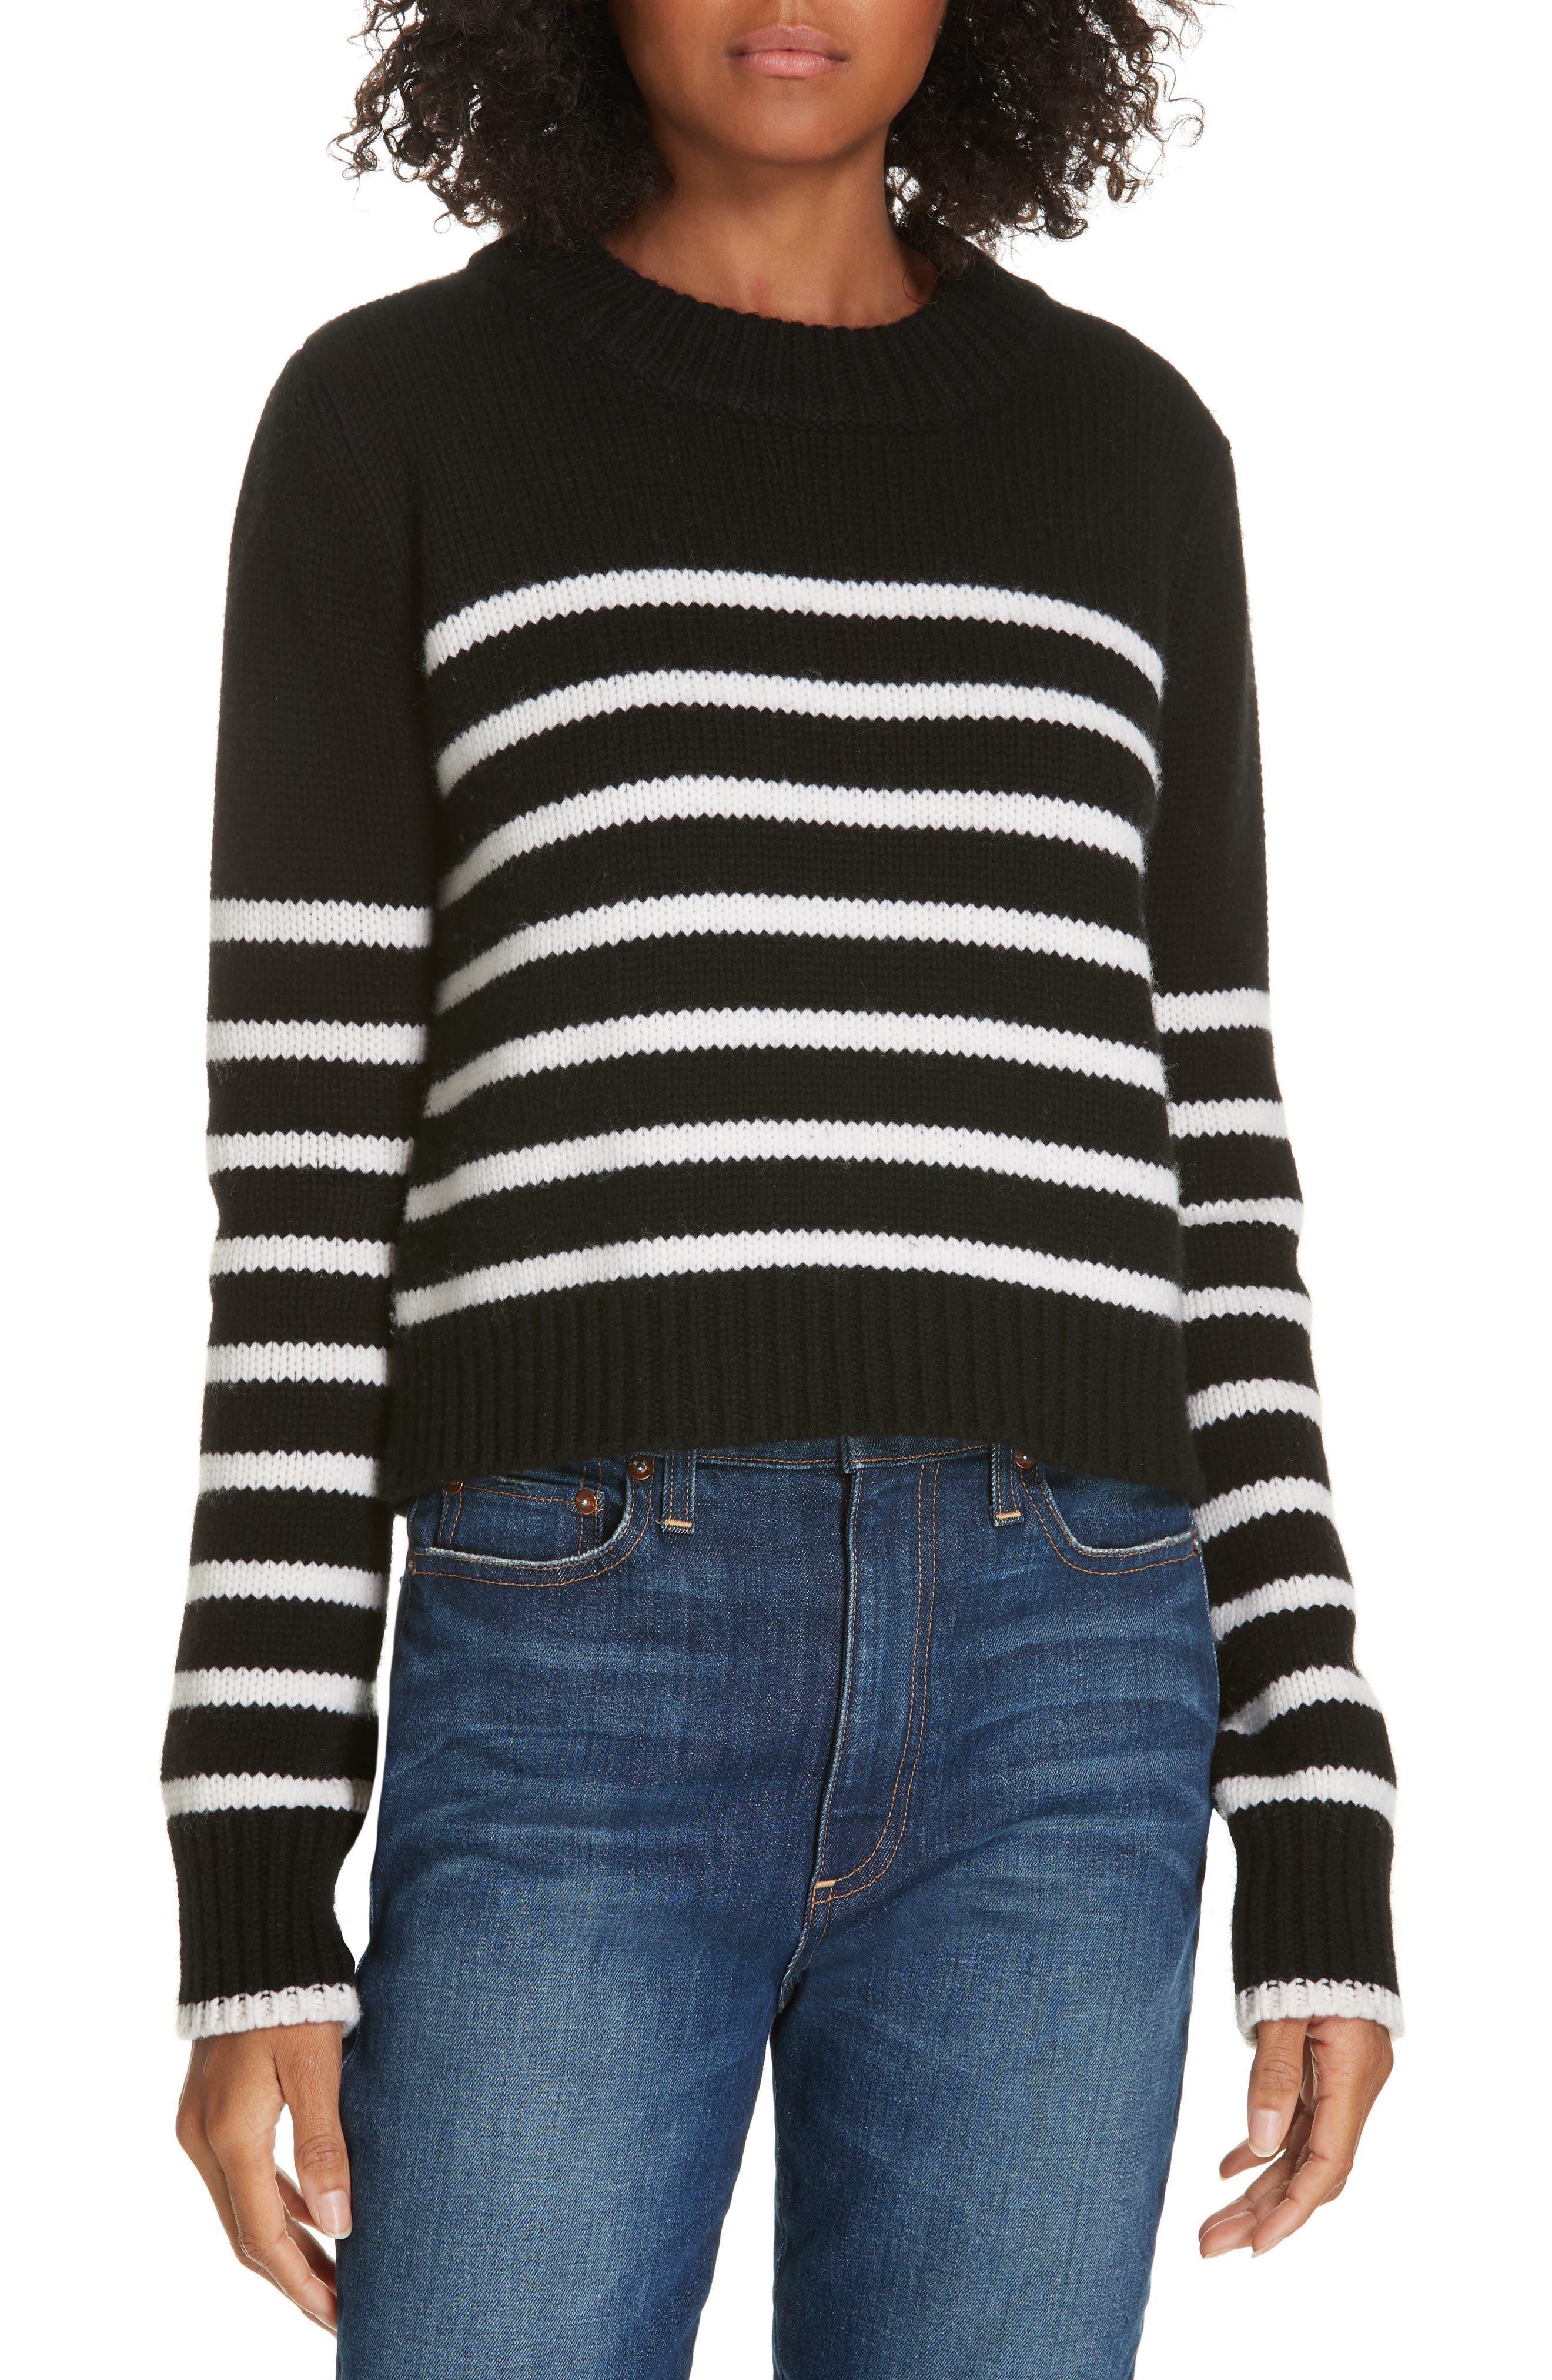 La Ligne Mini Maren Wool & Cashmere Sweater, Black